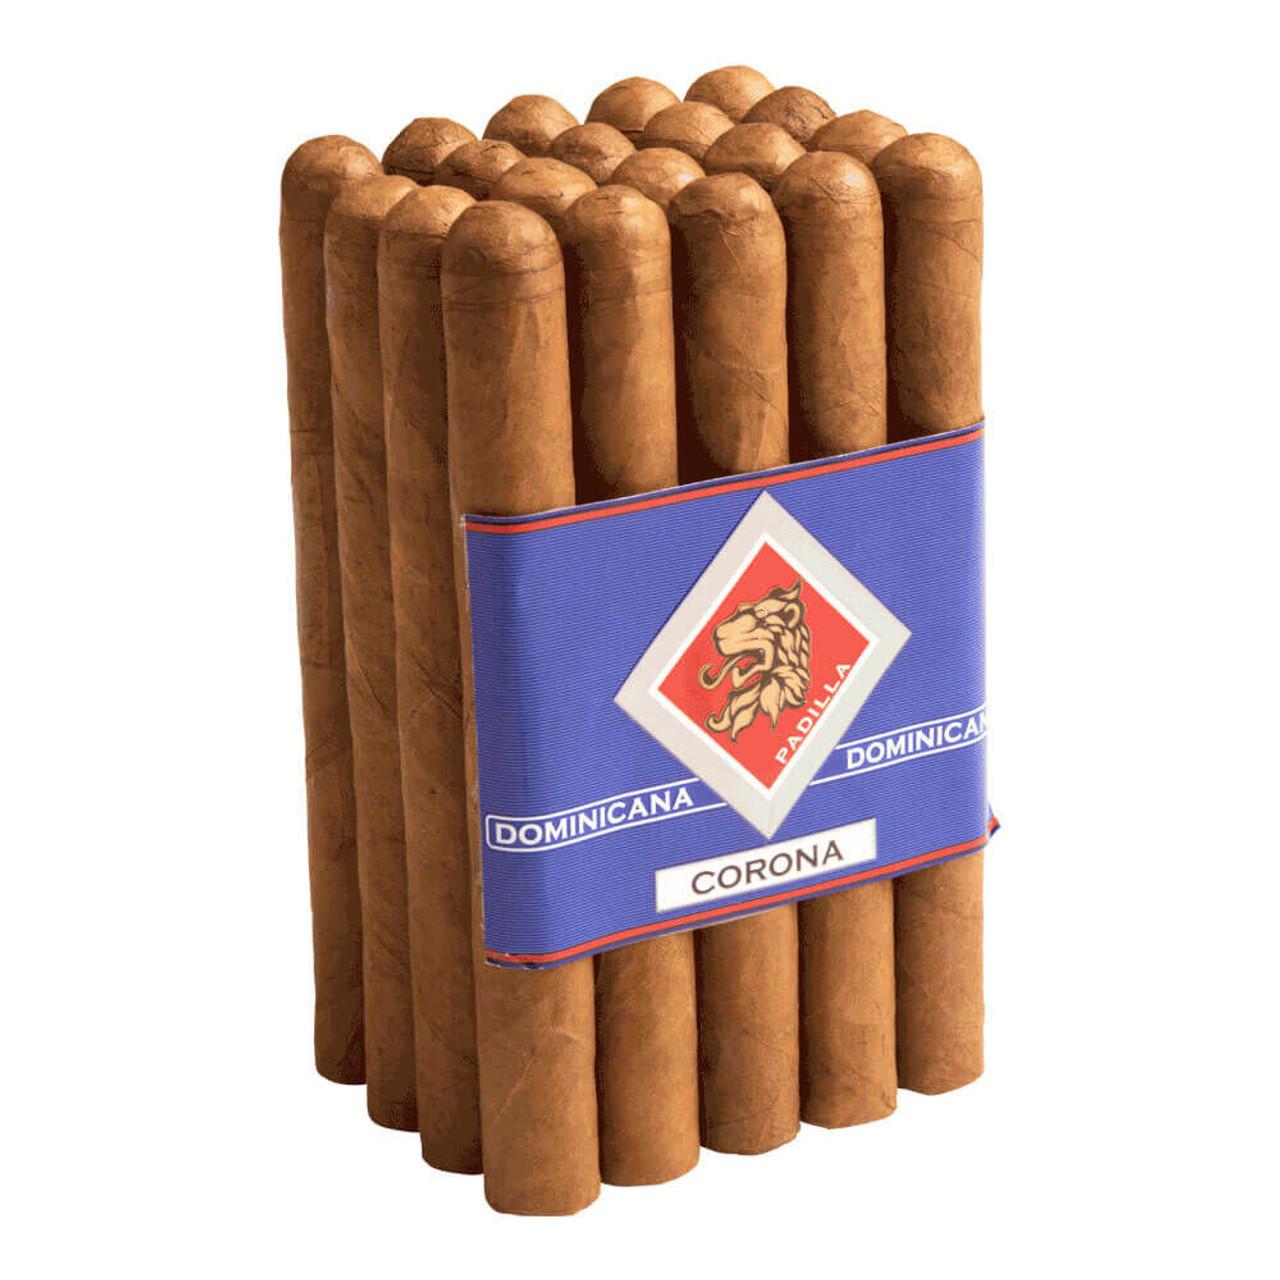 Padilla Dominicana Corona Cigars - 5.5 x 43 (Bundle of 20)